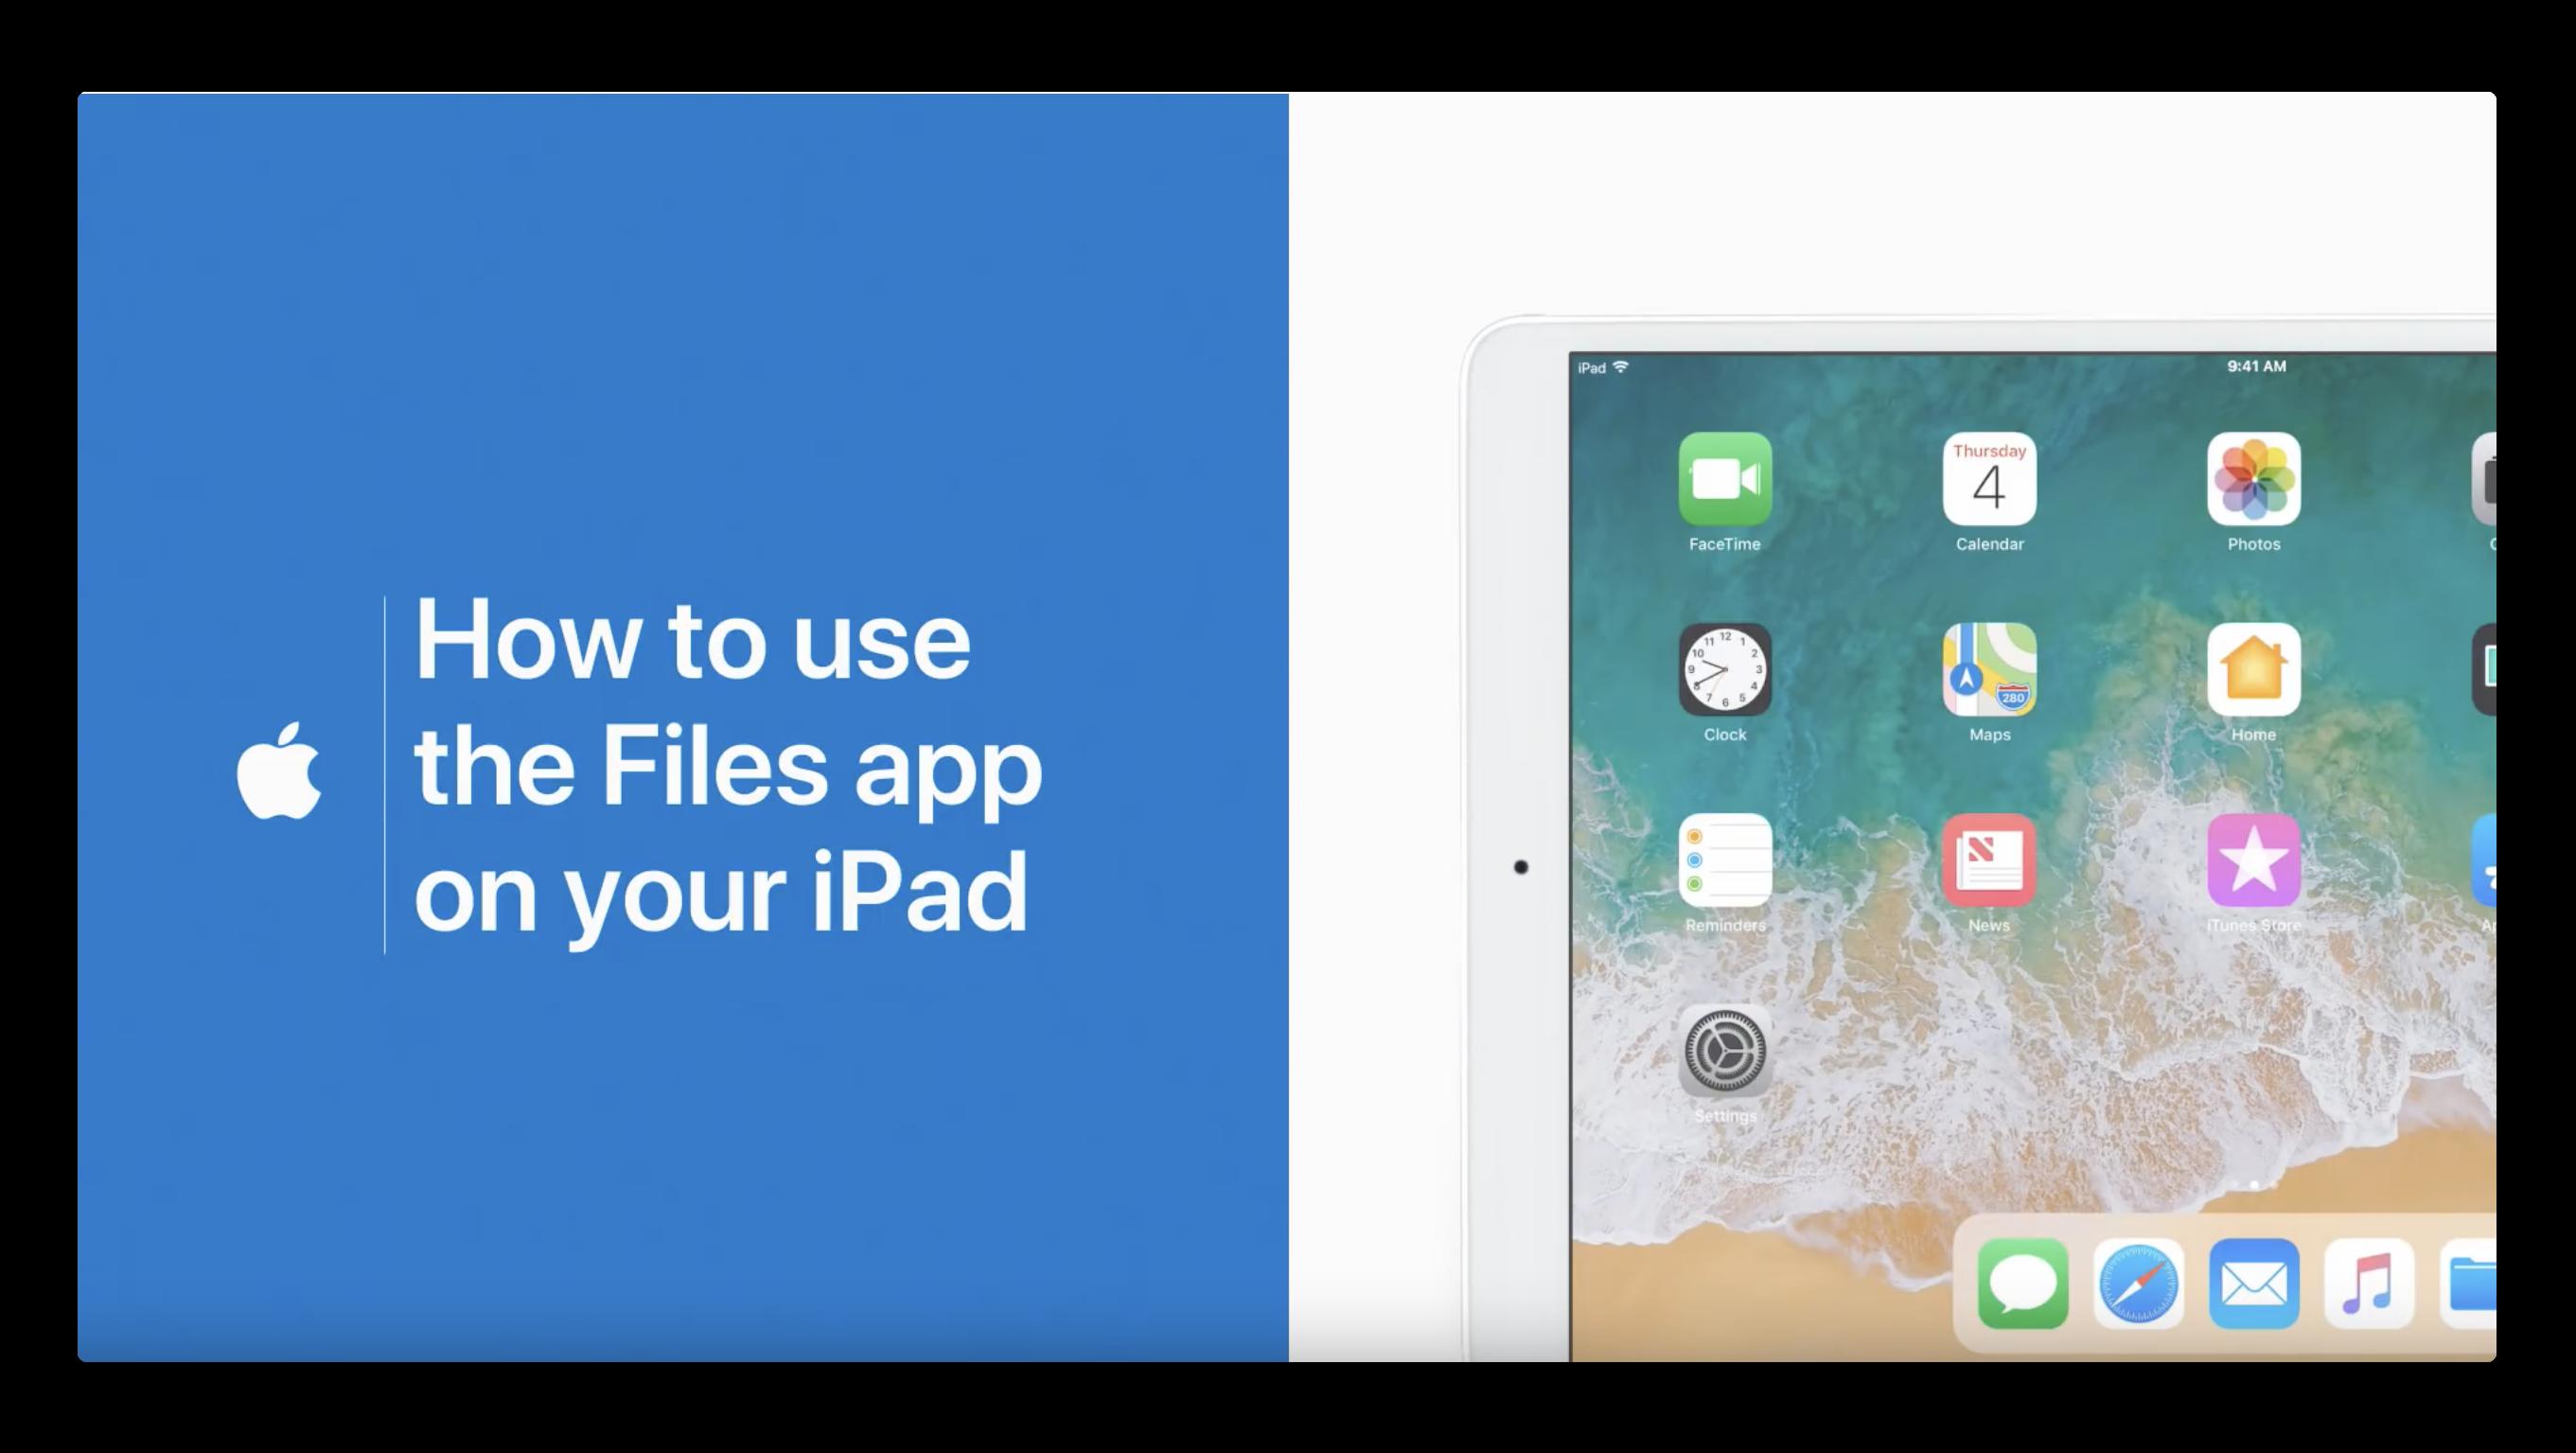 Apple Support、iPadでアプリ「ファイル」を使用するハウツービデオを公開